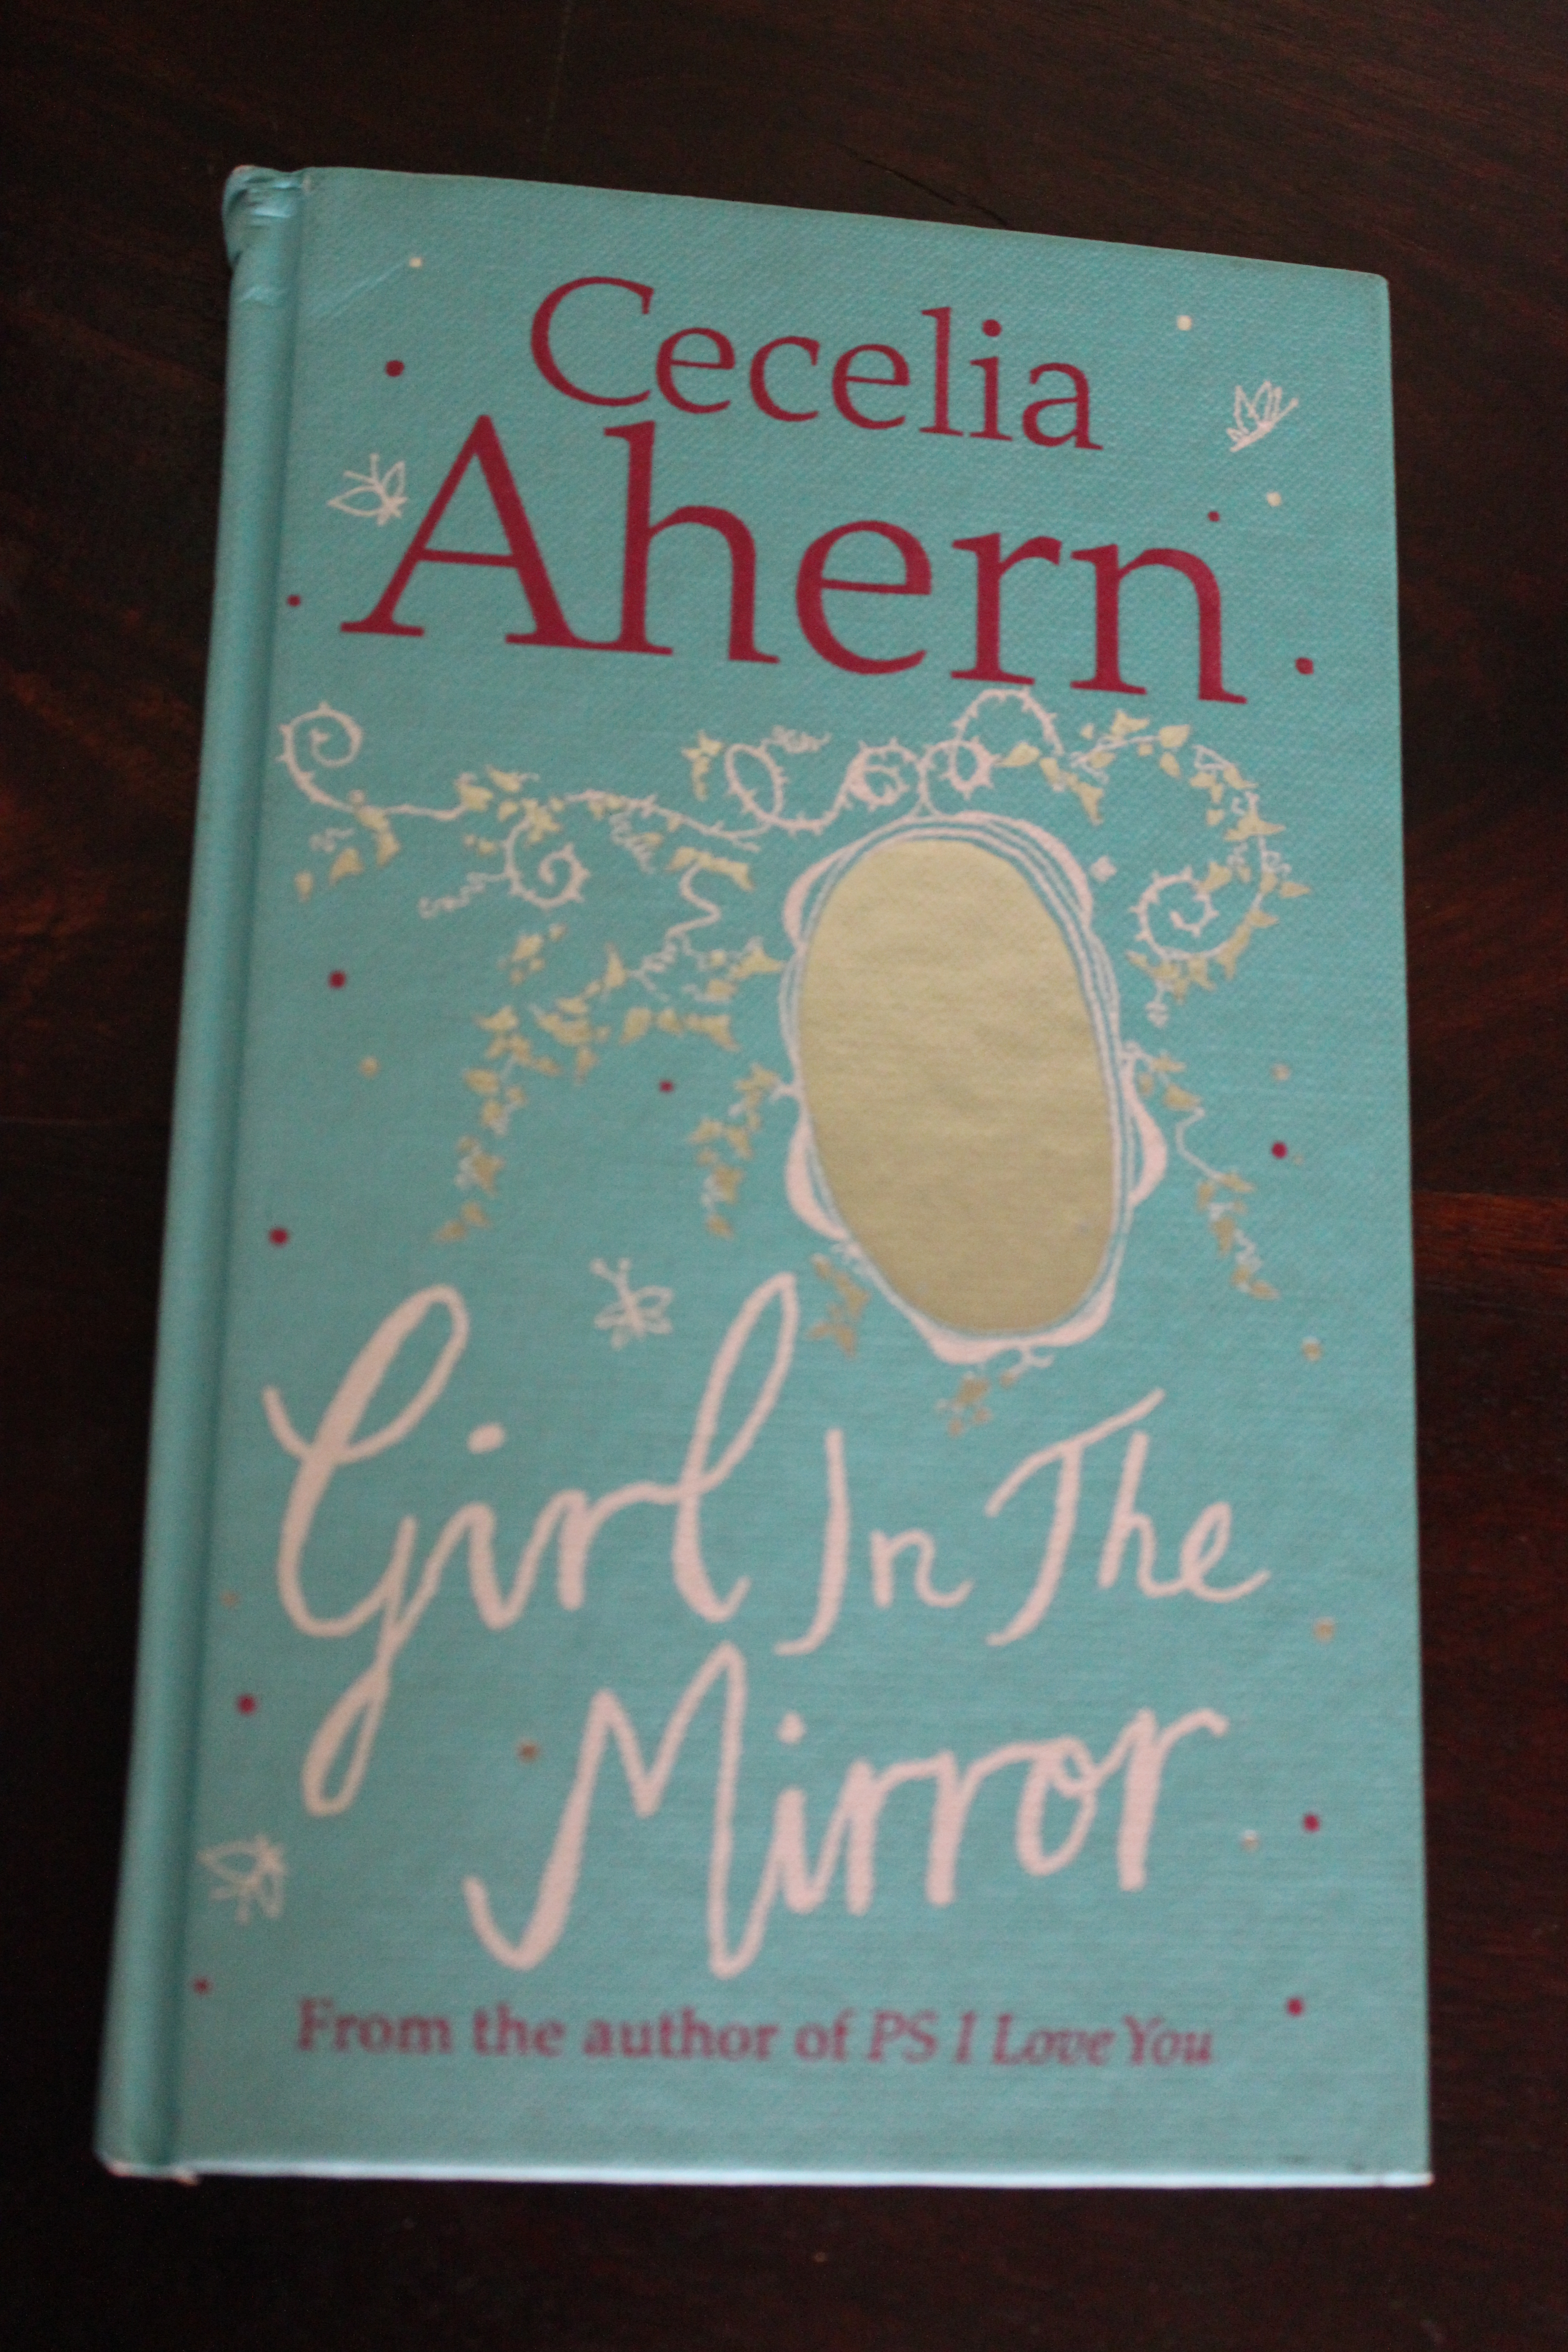 CECELIA AHERN GIRL IN THE MIRROR PDF DOWNLOAD